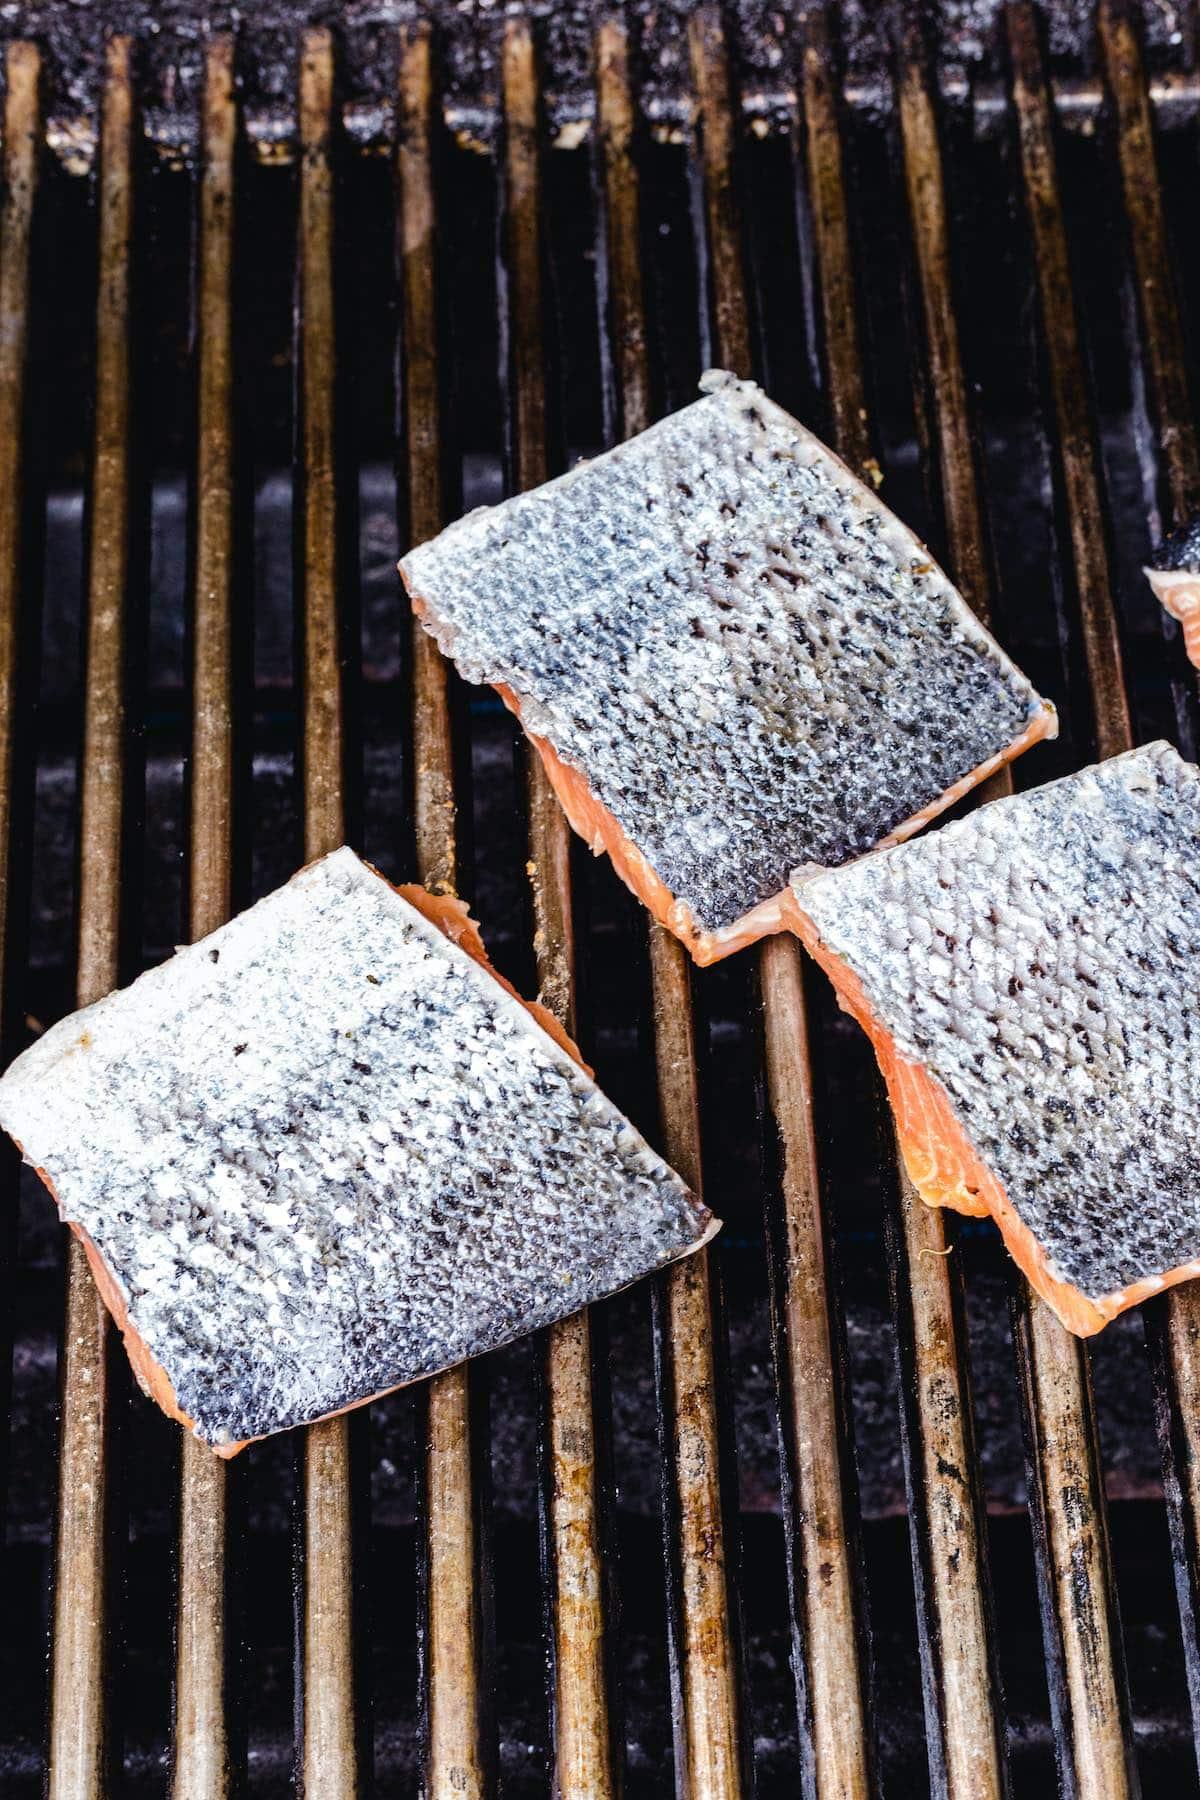 grill the salmon salmon flesh side down